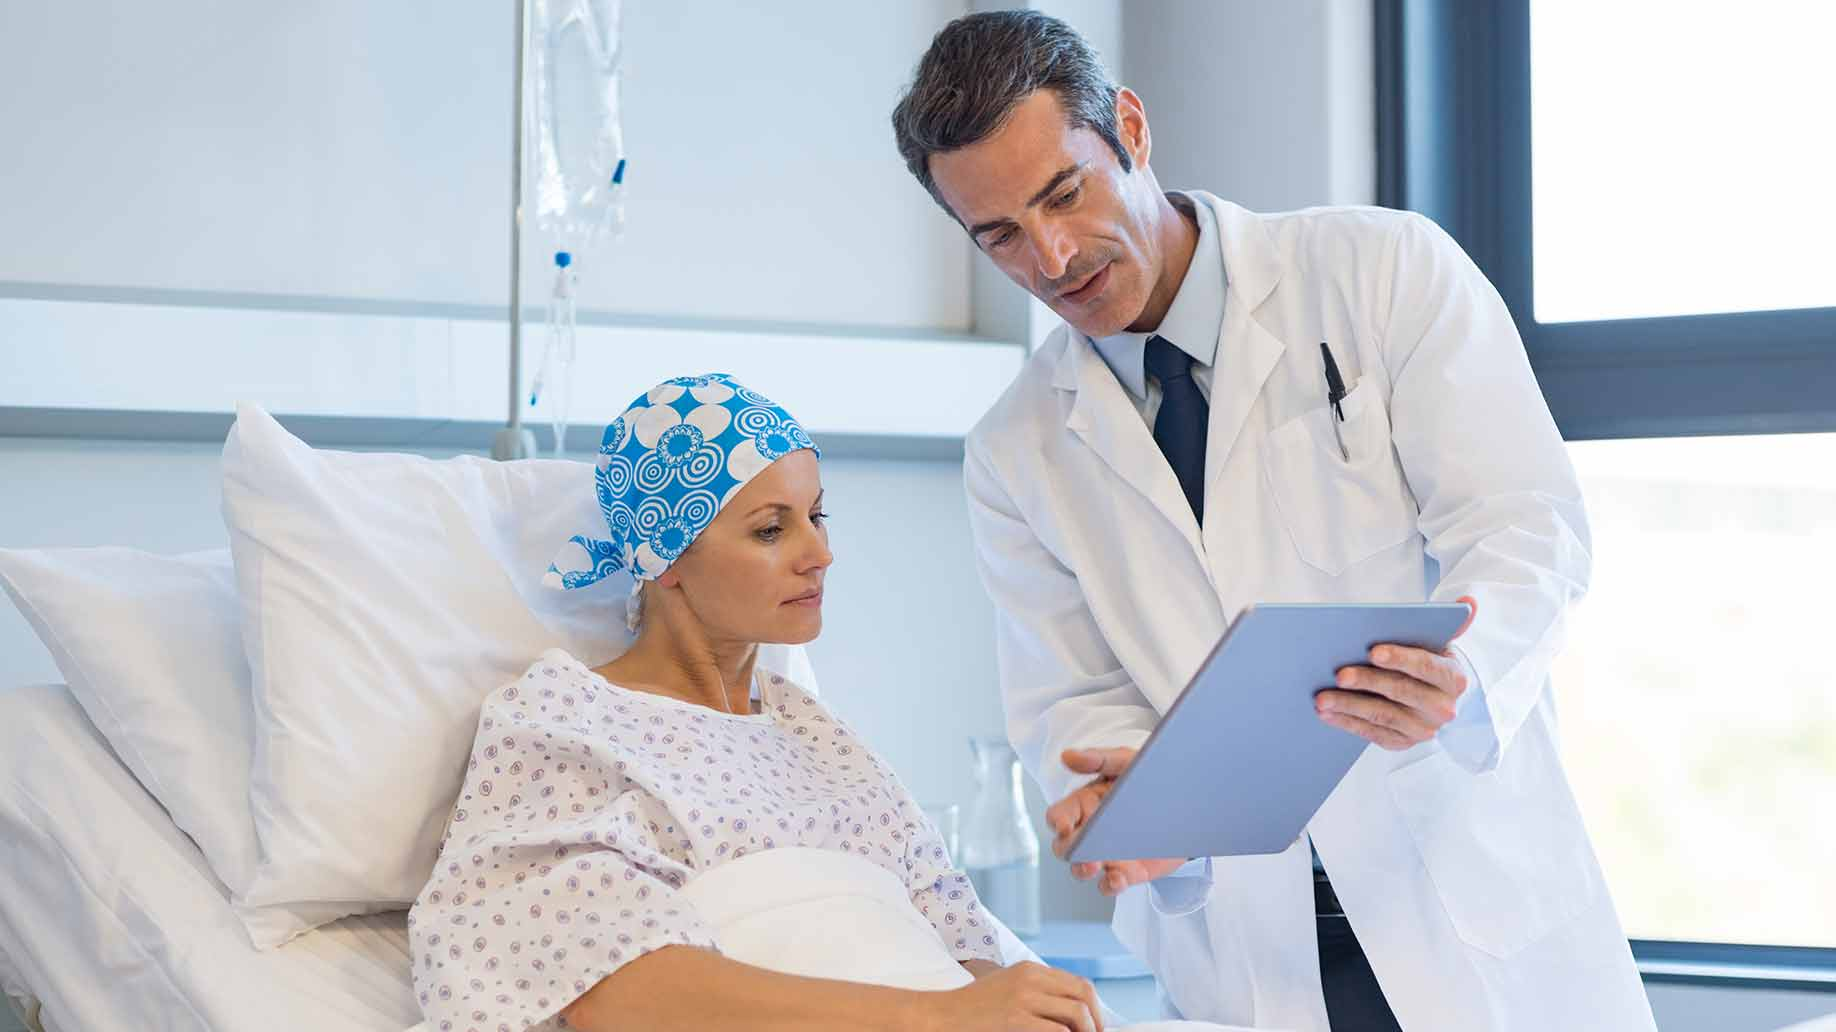 cancer treatment vitamin c natural health benefits